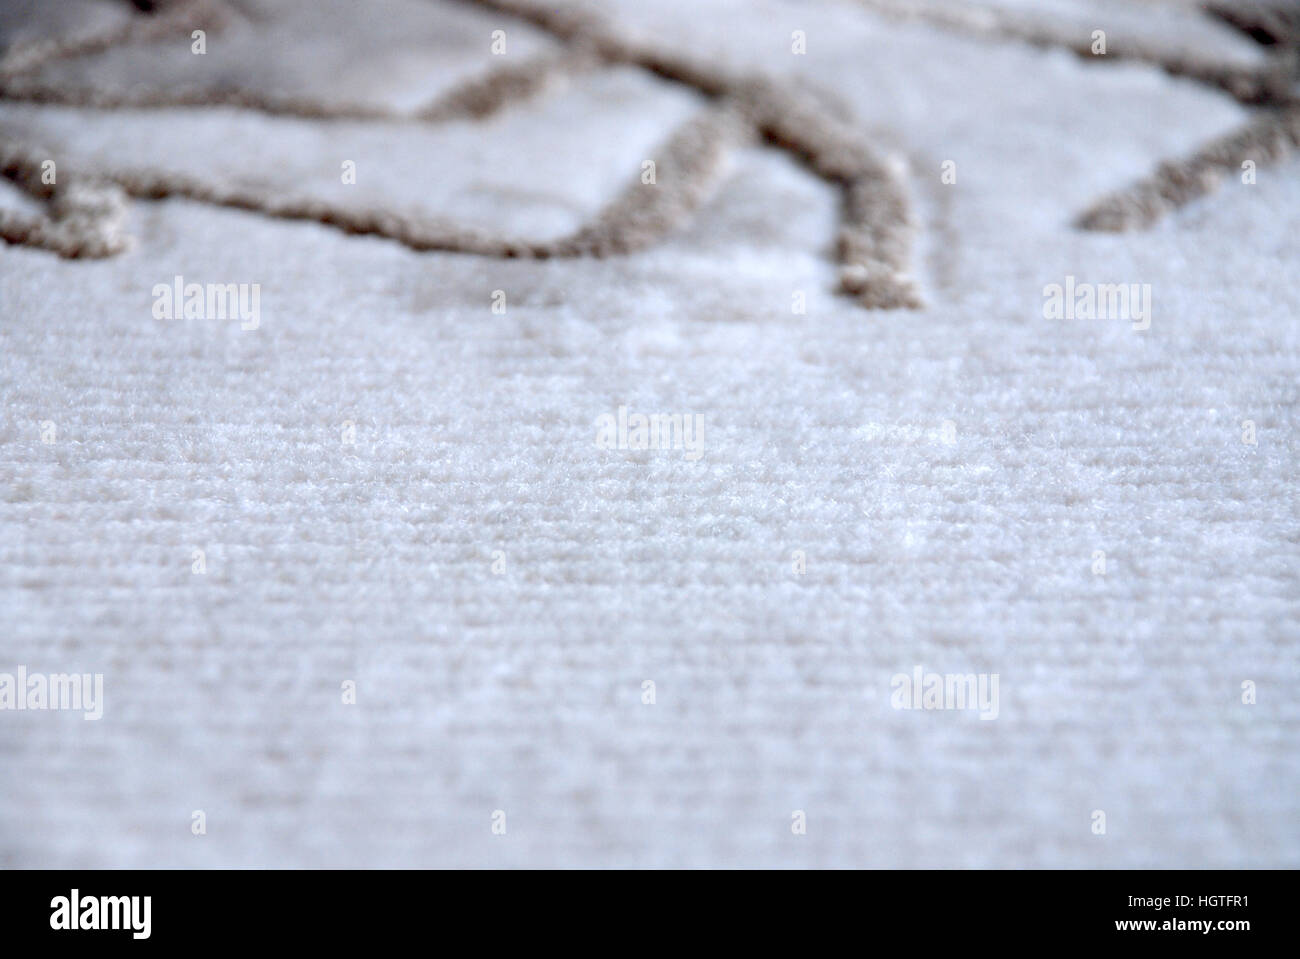 Graue Textur Teppich Dekor Hintergründe Stockbild